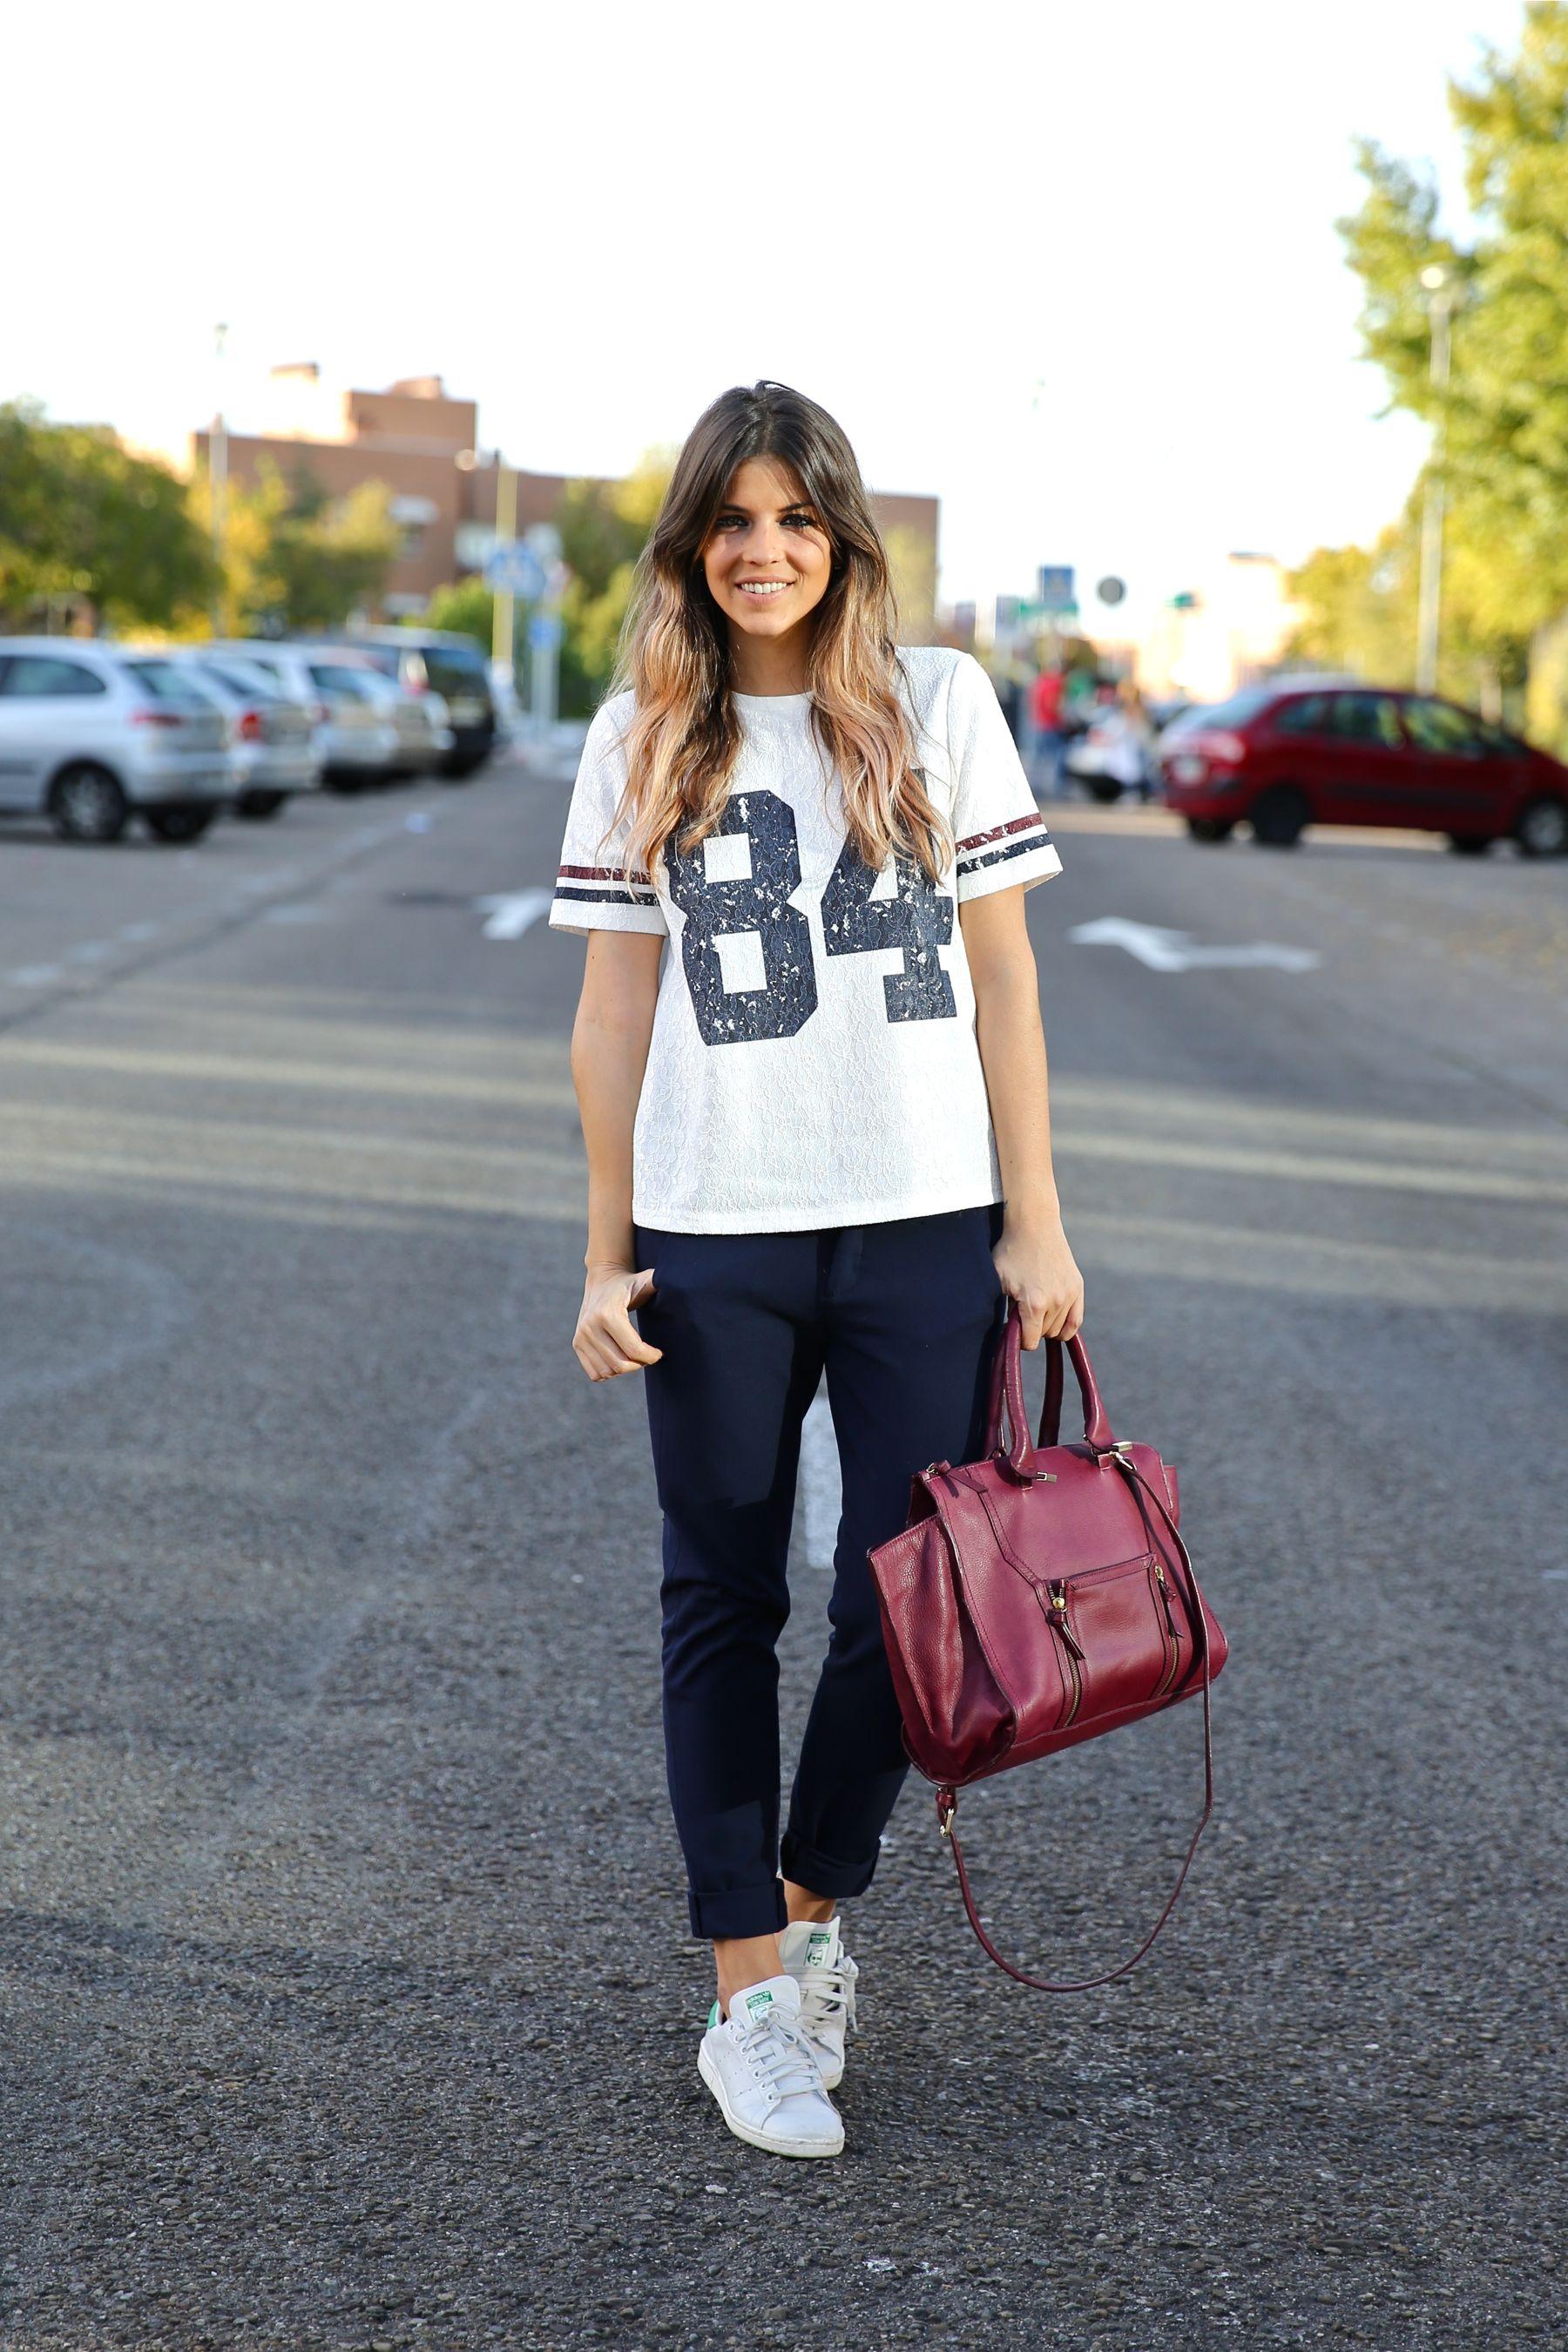 trendy_taste-look-outfit-street_style-ootd-blog-blogger-fashion_spain-moda_españa-zara-stan_smith-adidas-cosette-tee-baseball-camiseta-numero-pantalón-capri-pinzas-4